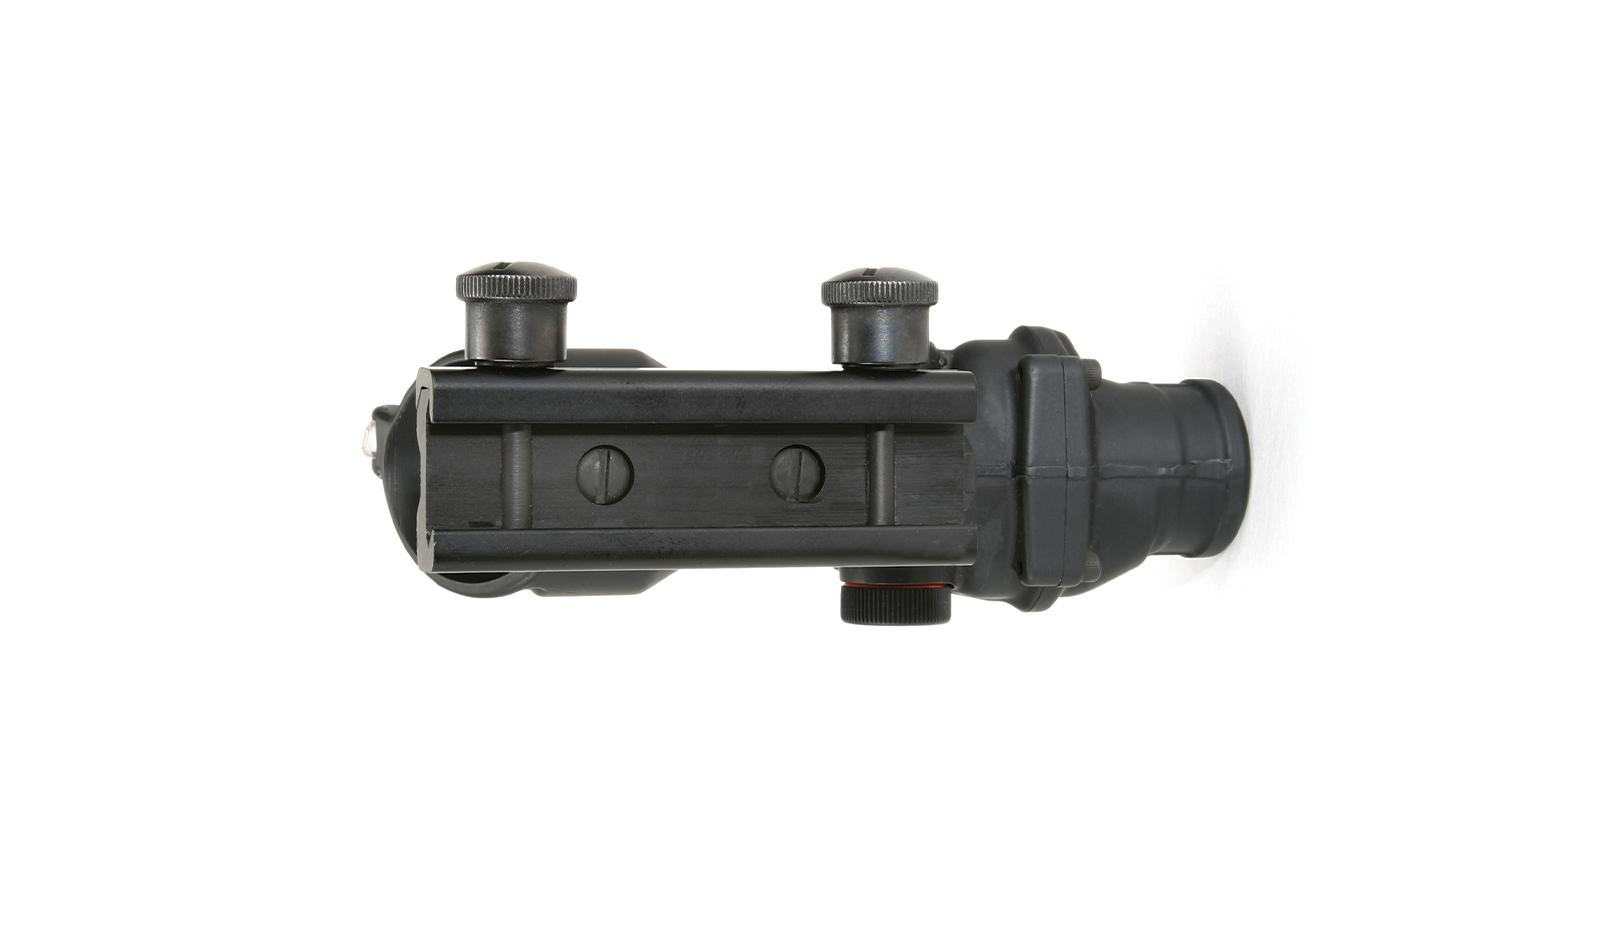 TA31-D-100549 angle 10